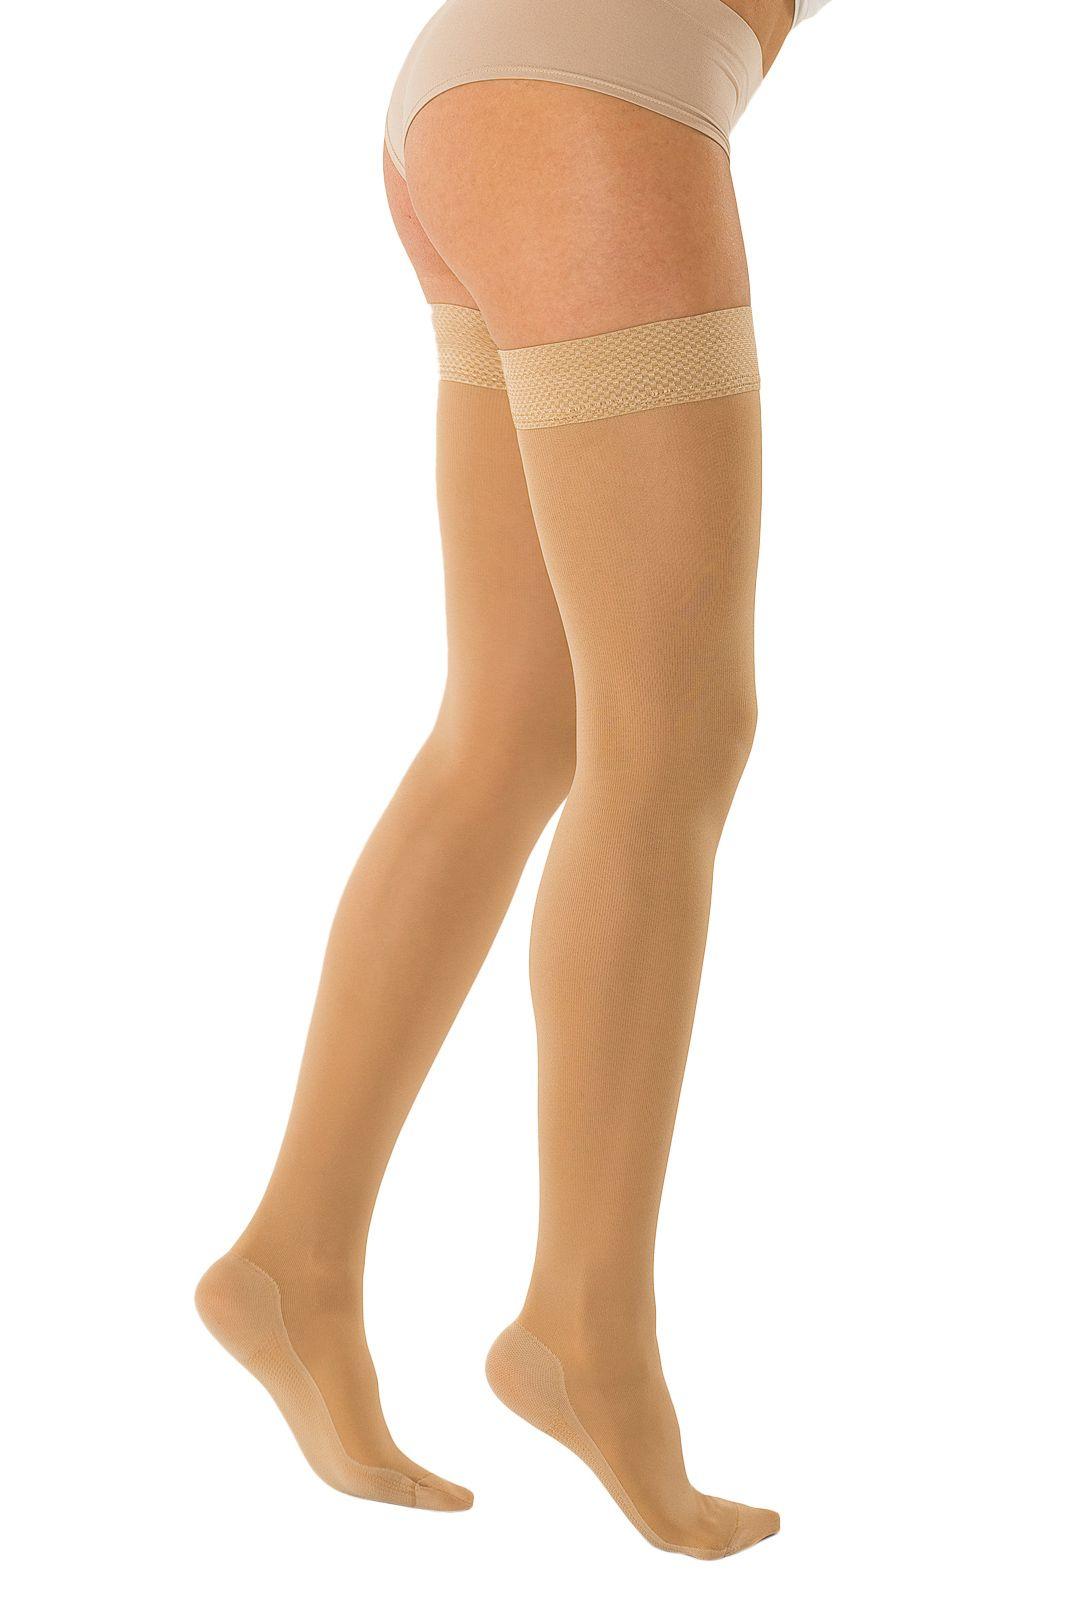 3b676da21a721 Solidea Marilyn Class 1 Thigh Hold-up Stockings - Daylong